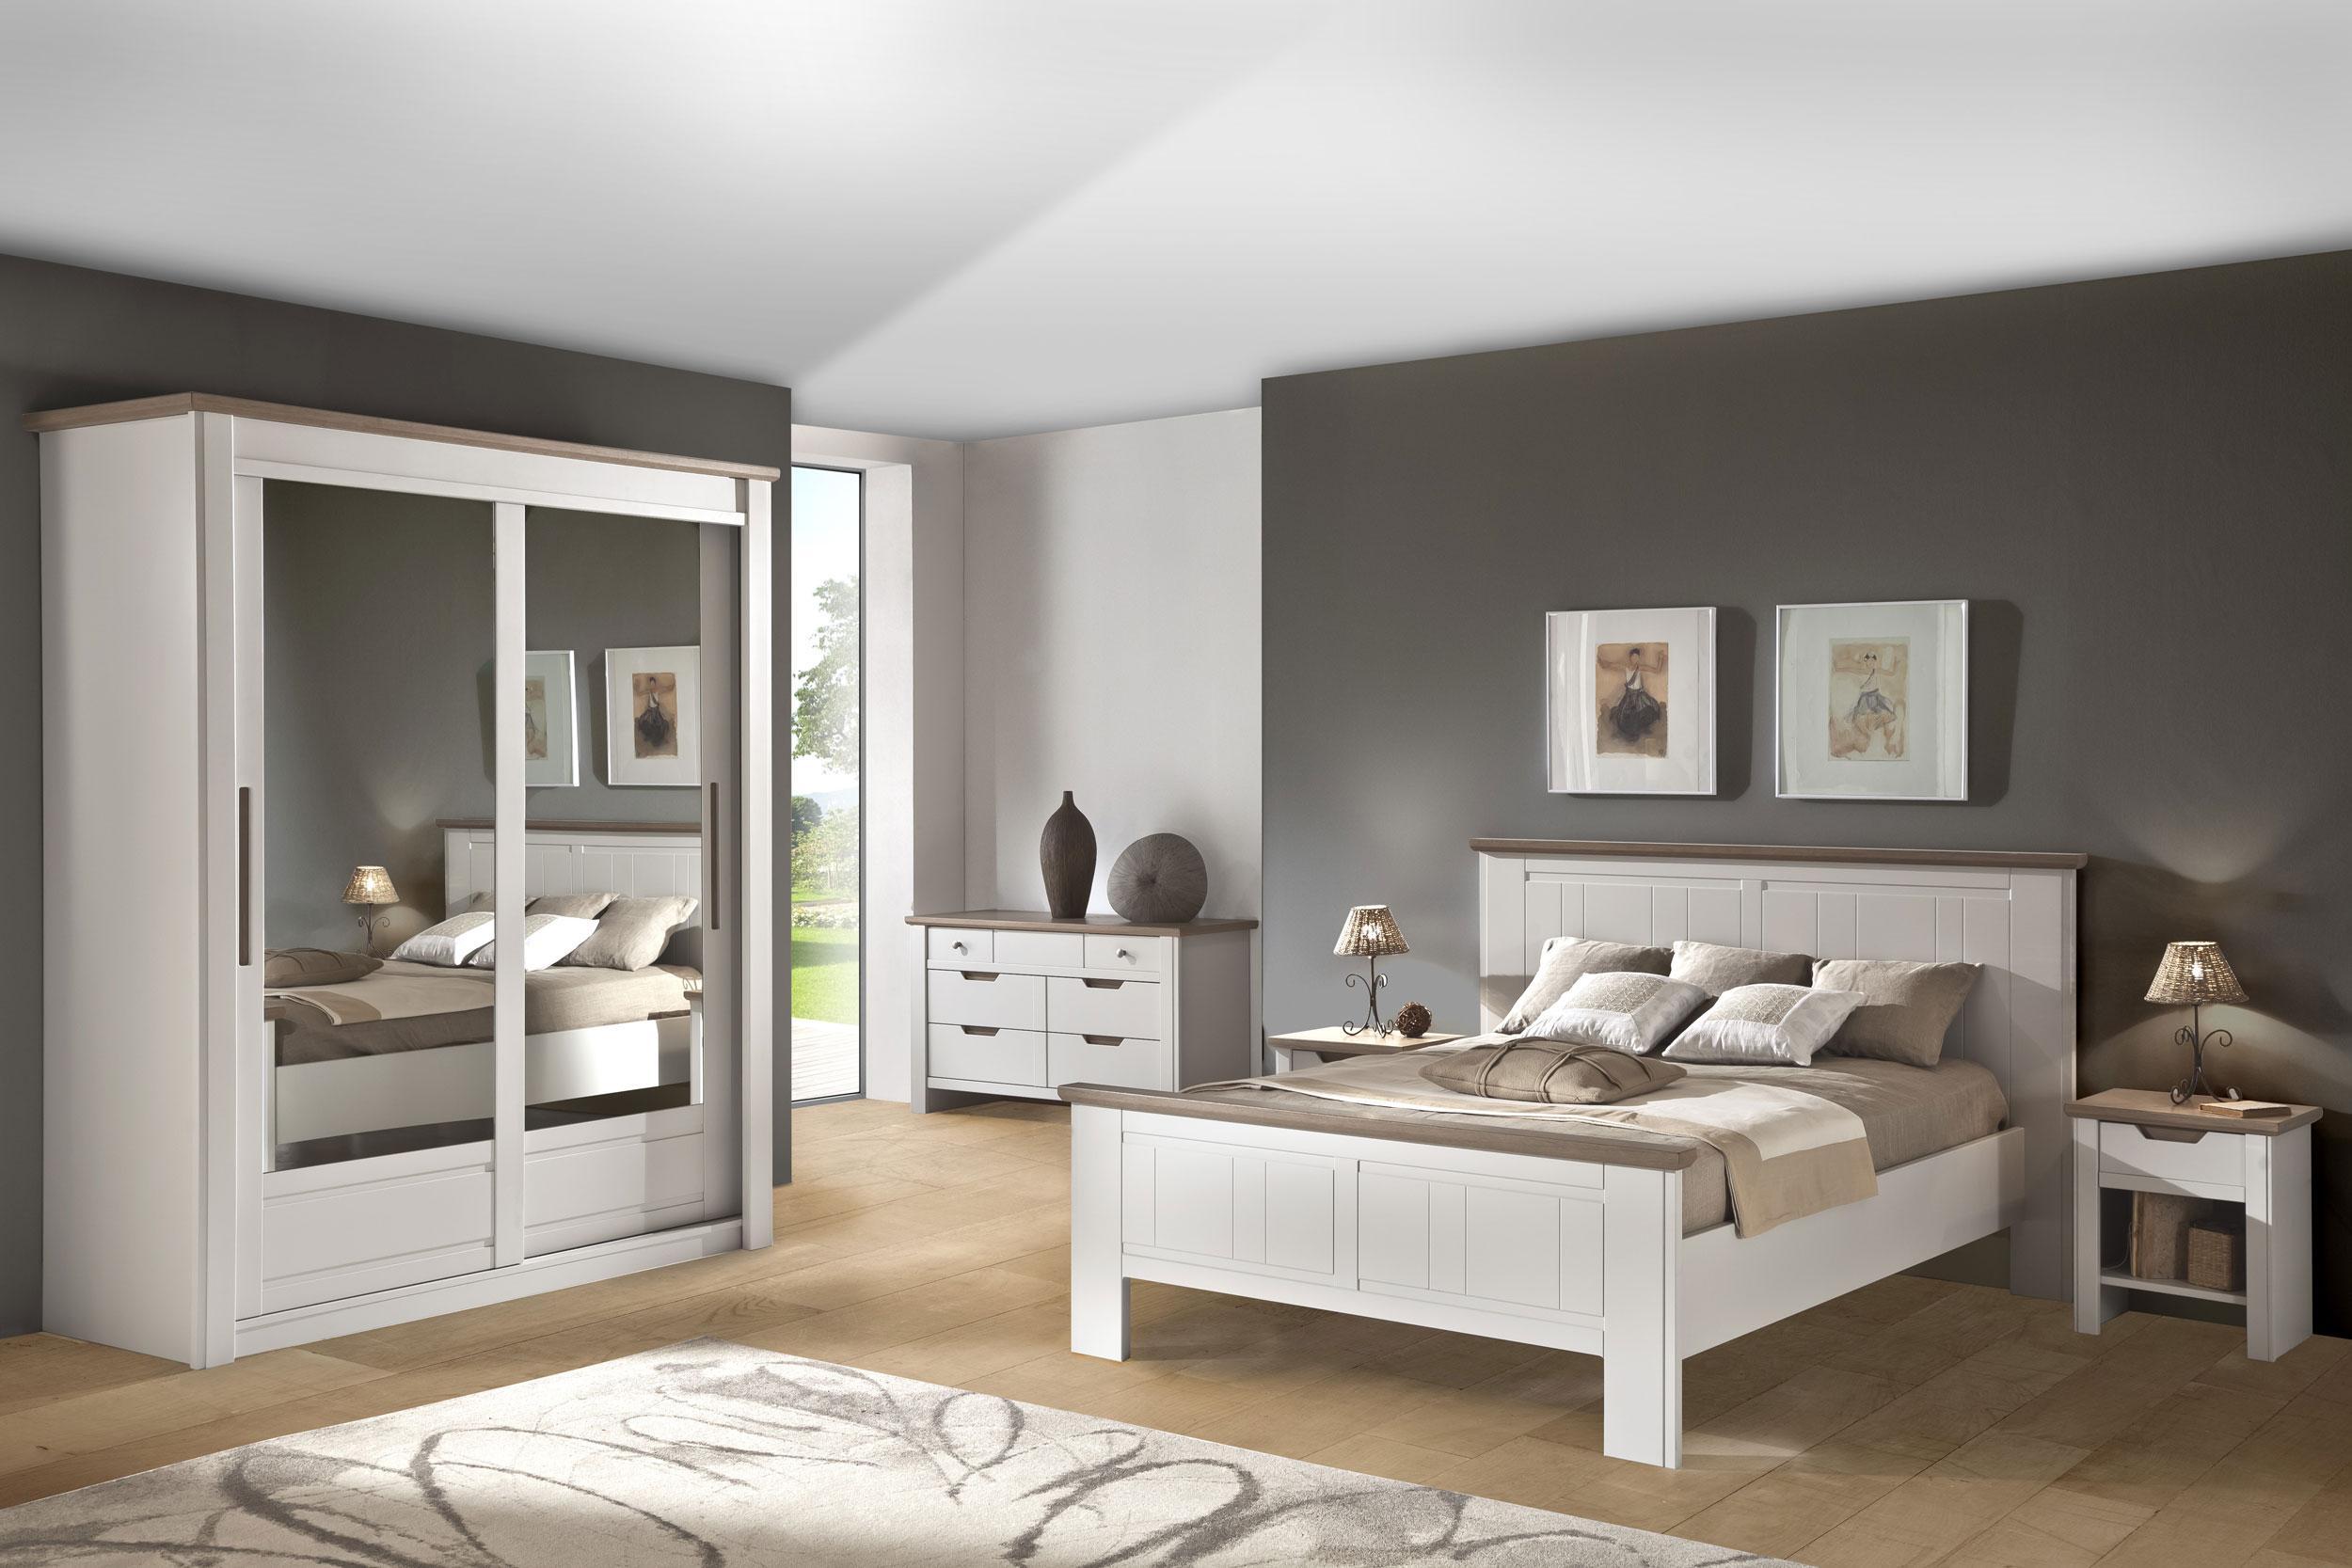 Idee Deco Chambre Meuble Blanc   Deco Chambre